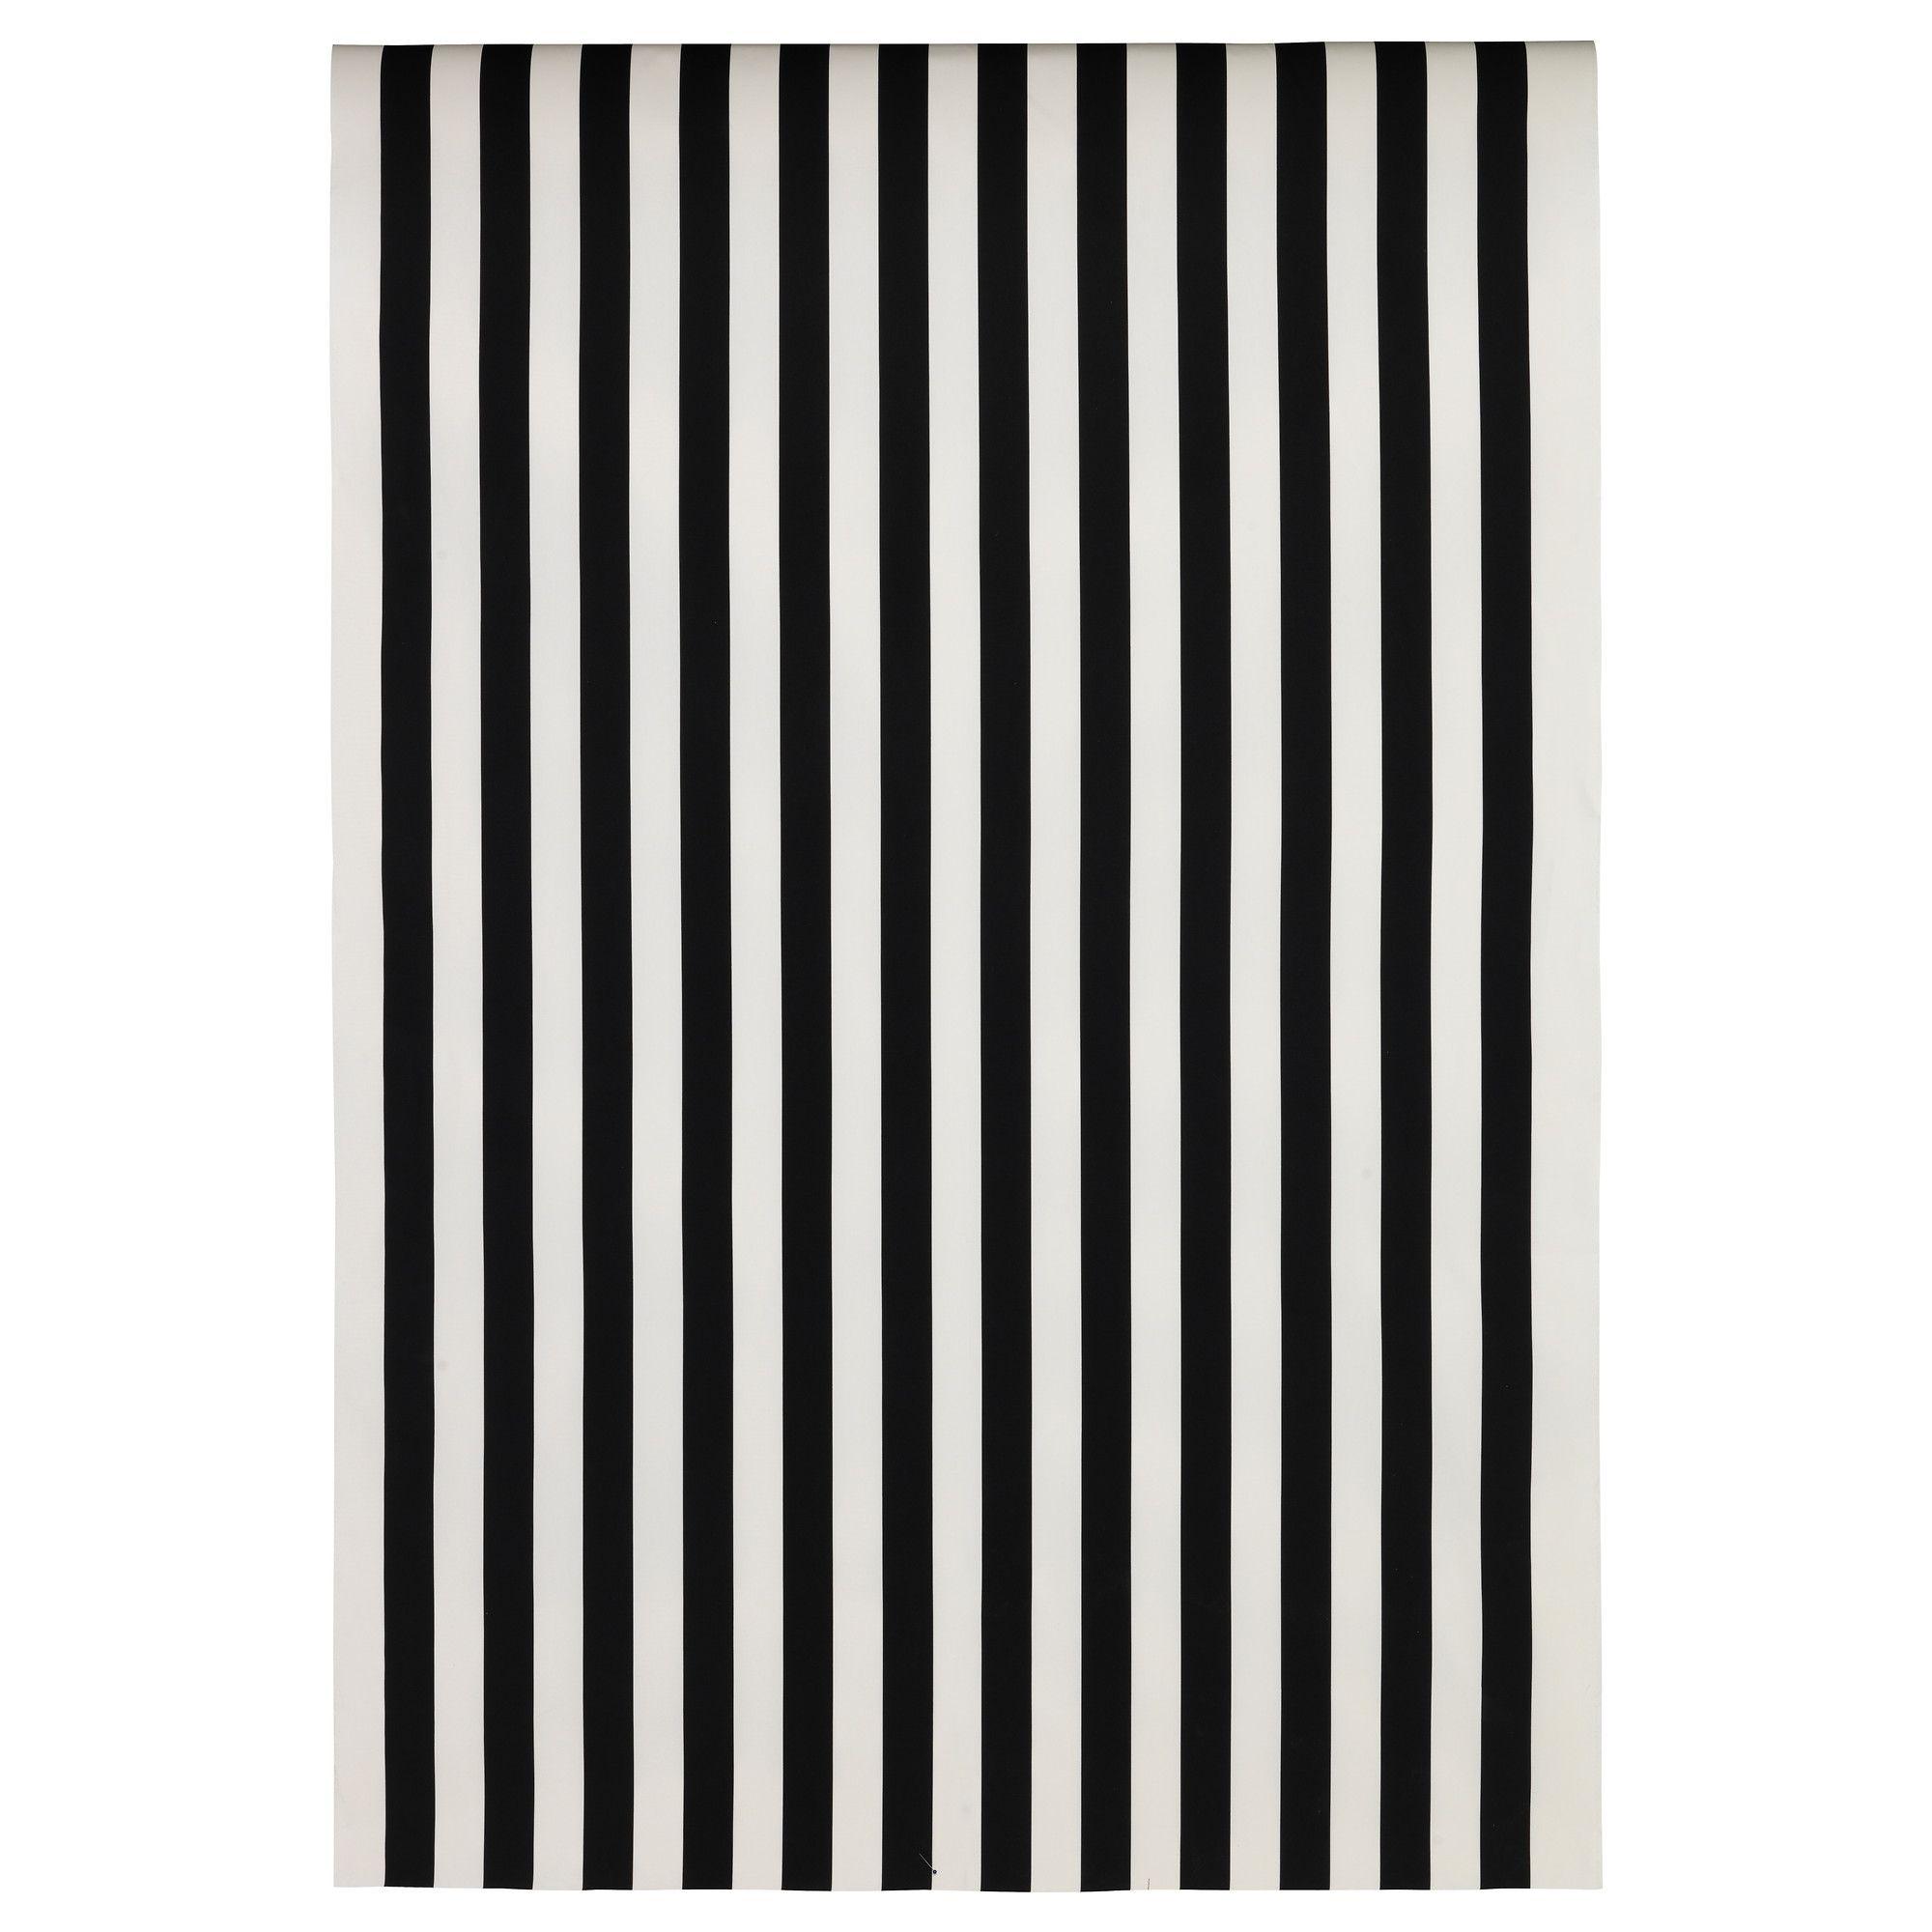 SOFIA Tela por metros, de rayas anchas, negro/blanco | Pinterest